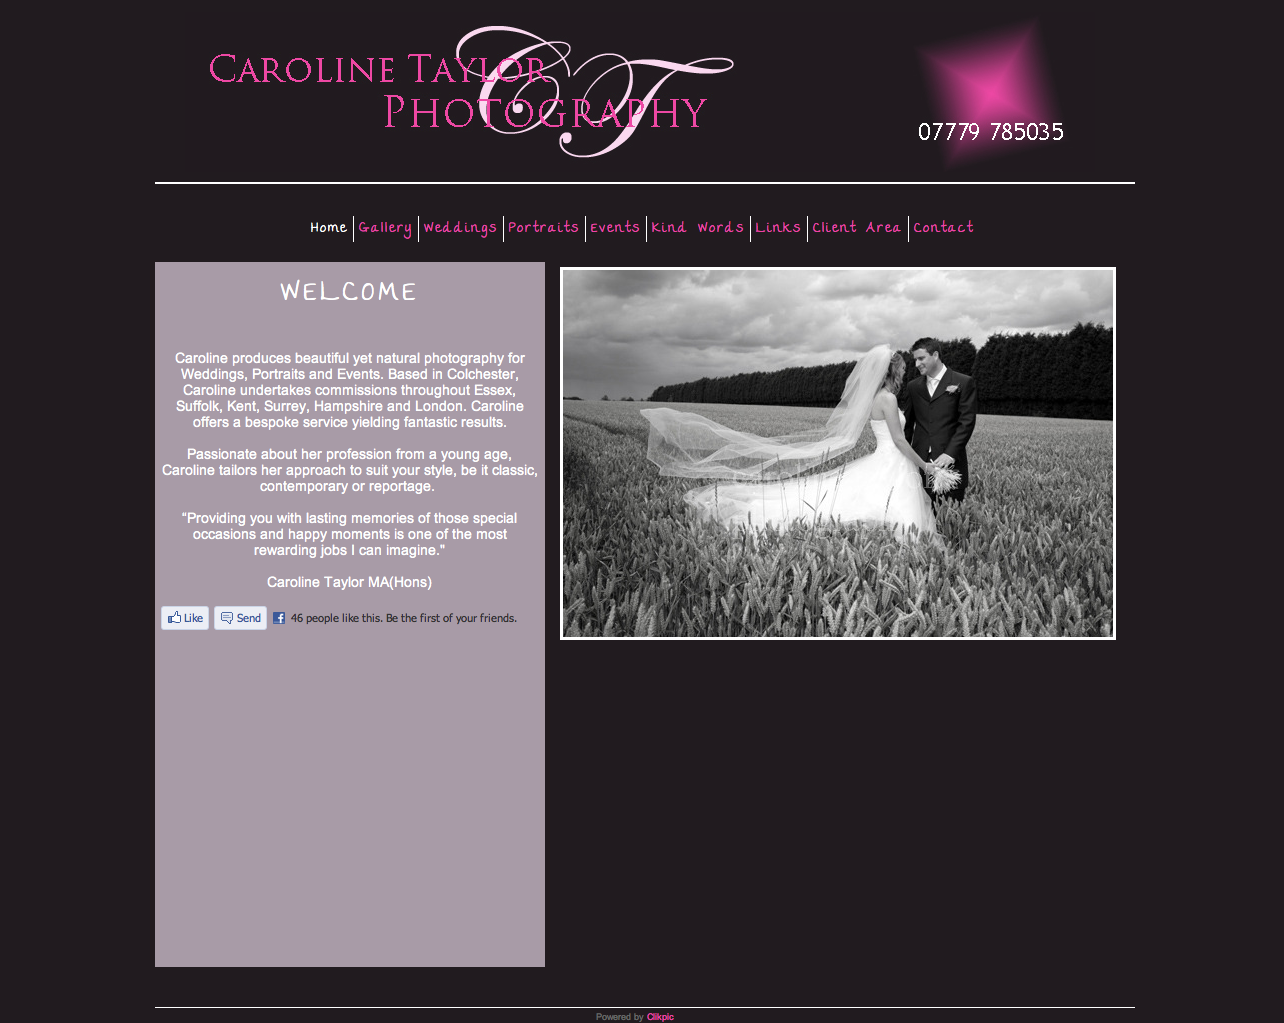 Caroline Taylor Photography